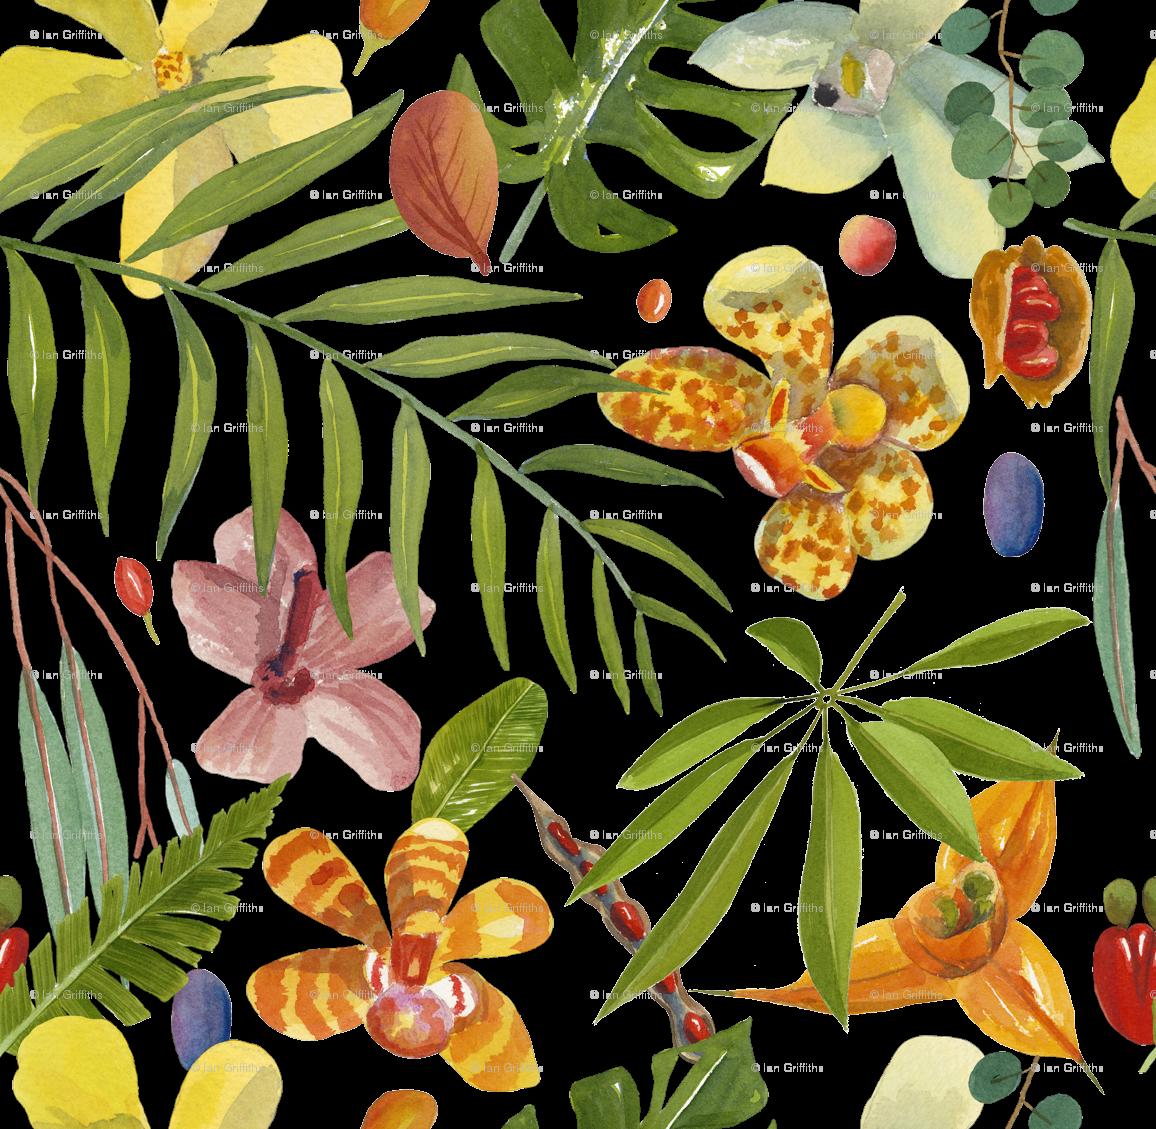 Jungle clipart flora and fauna. Tropical leaves wallpaper parrots